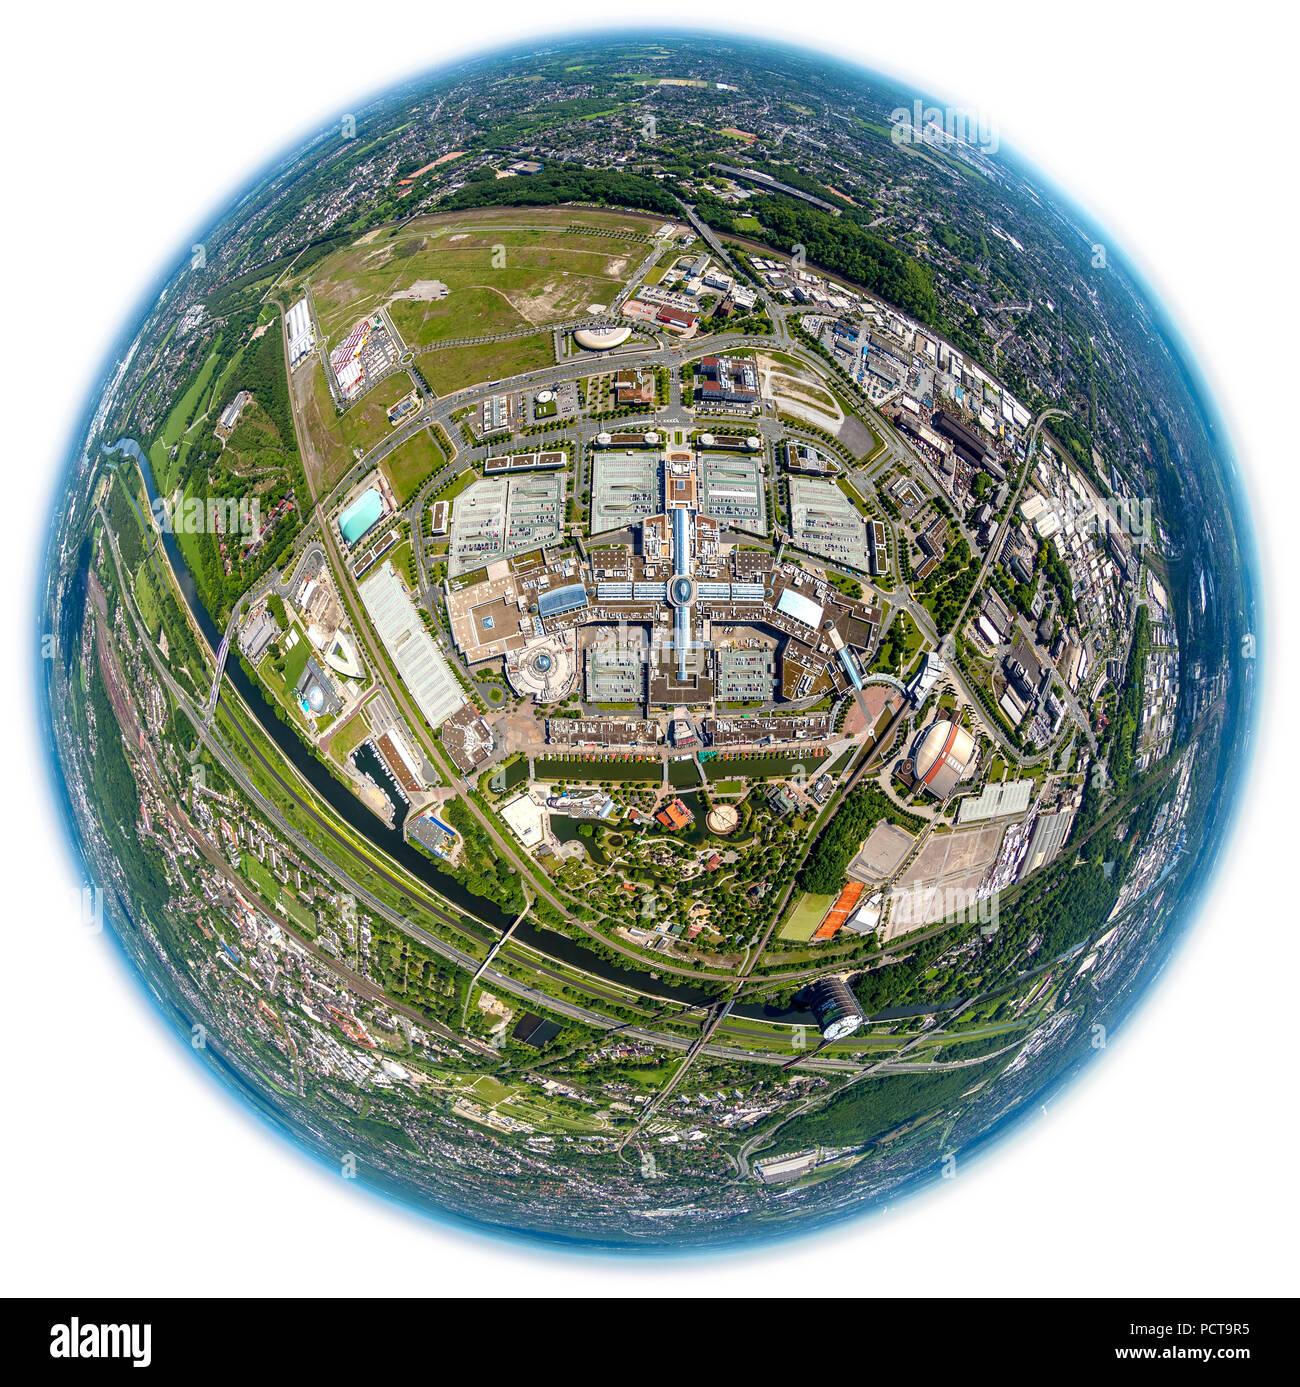 Fisheye lens, Centro Oberhausen, Neue Mitte, shopping mall, promenade, car park, view of Oberhausen, Oberhausen, Ruhr area, North Rhine-Westphalia, Germany Stock Photo